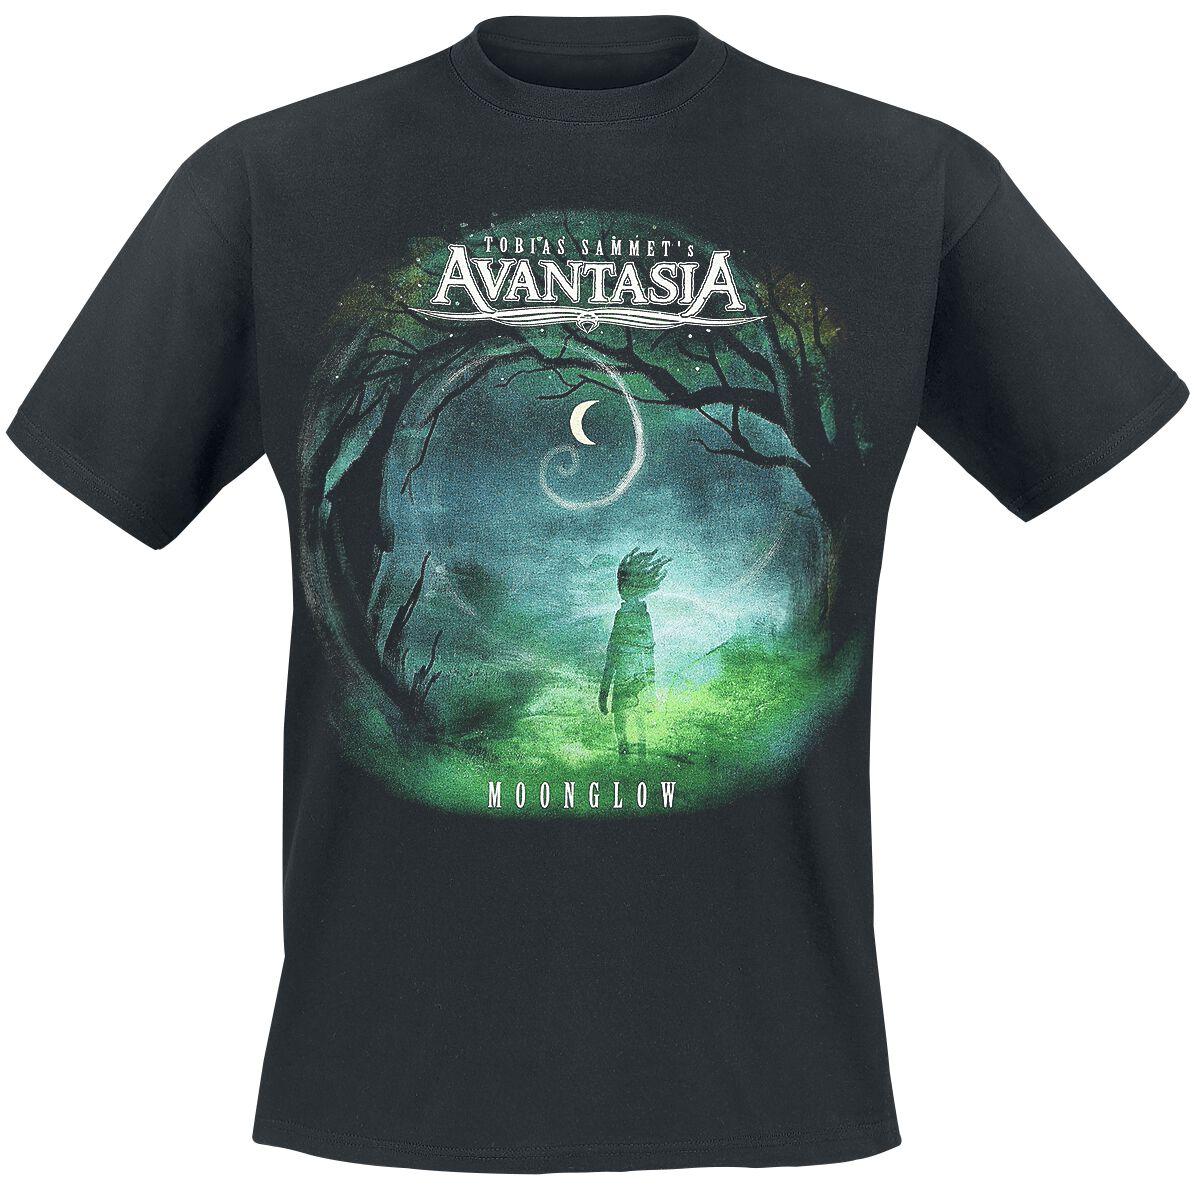 Image of Avantasia Moonglow T-Shirt schwarz